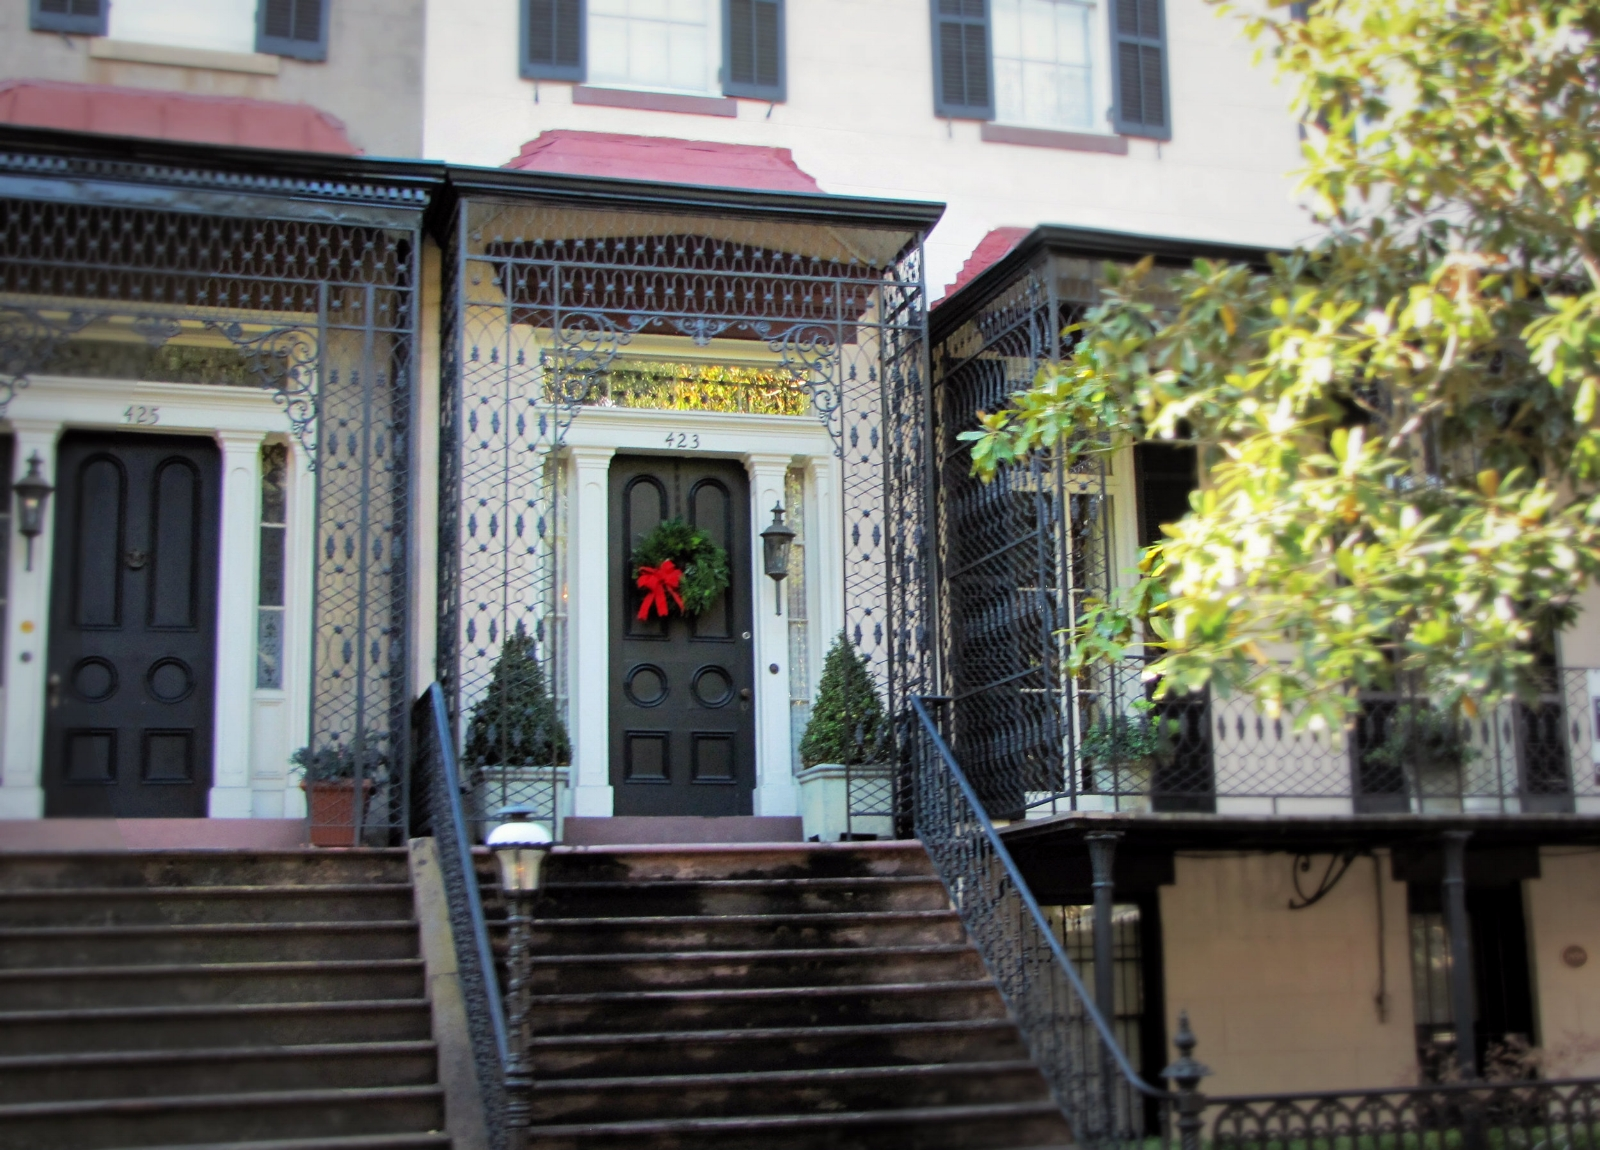 ornate ironwork historic house porch Savannah Georgia